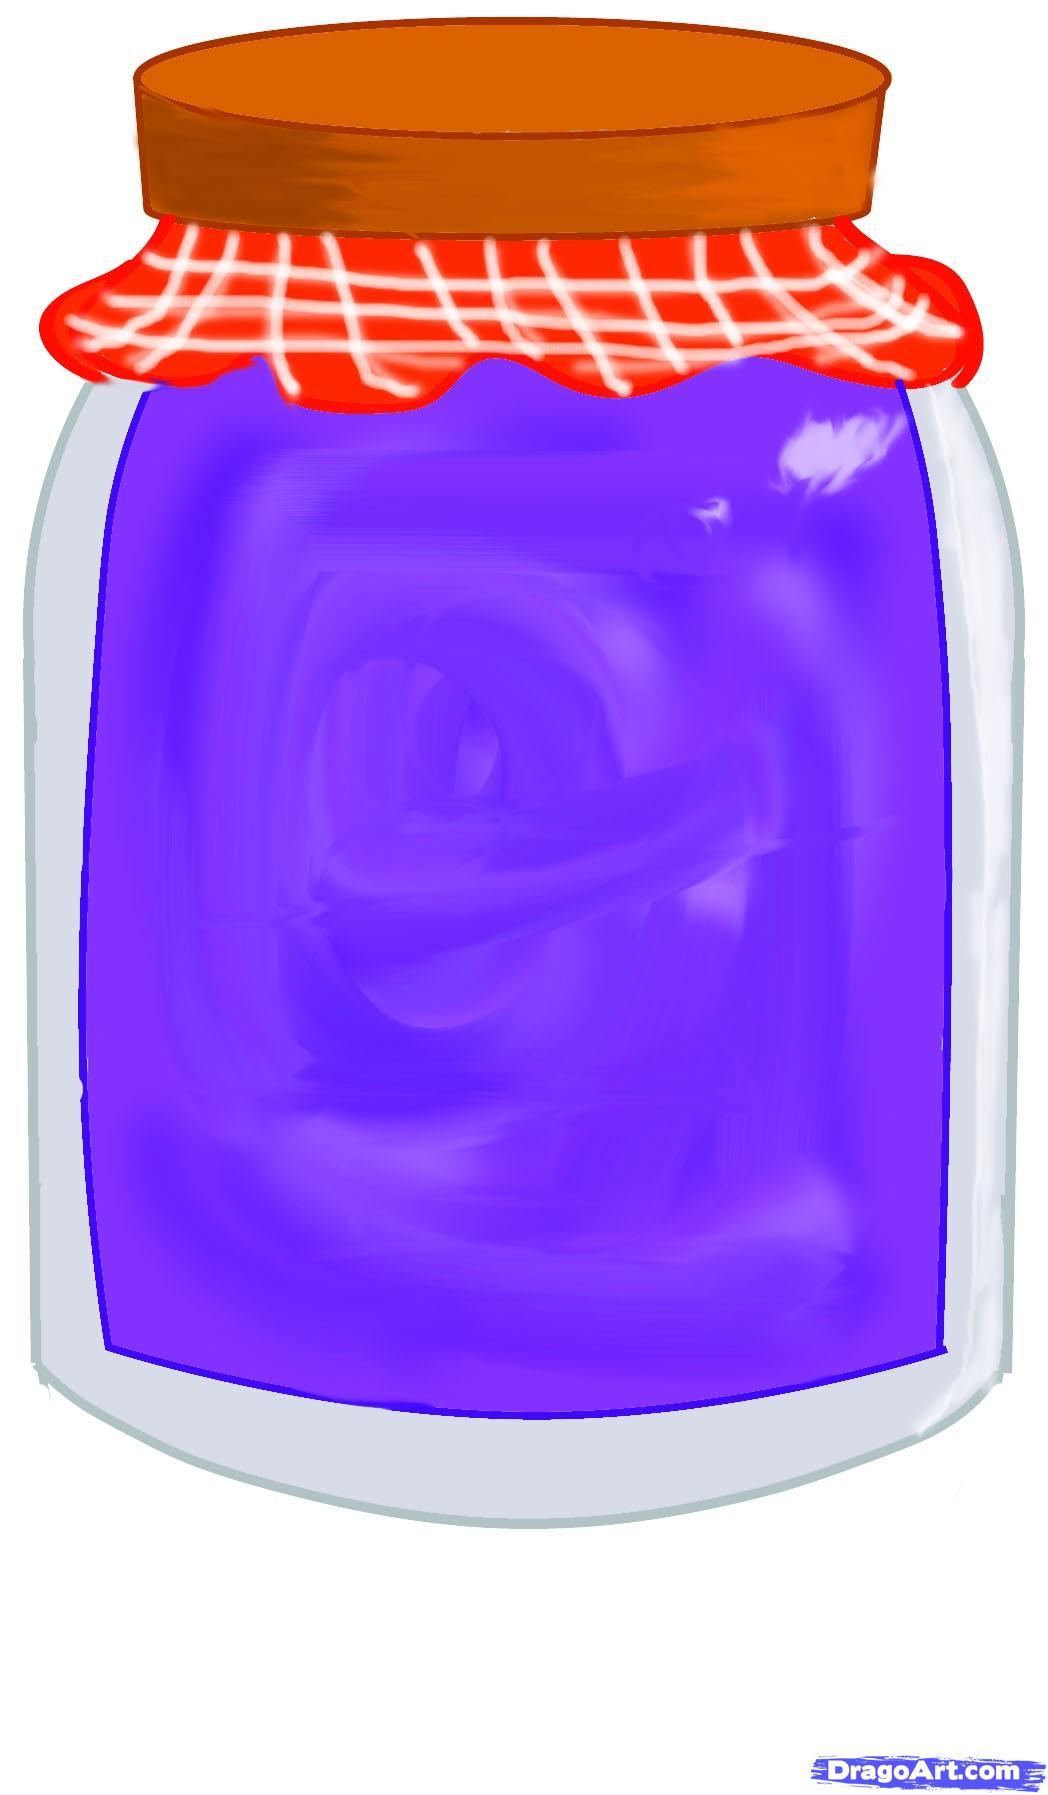 Drawn mason jar How a jar Step to